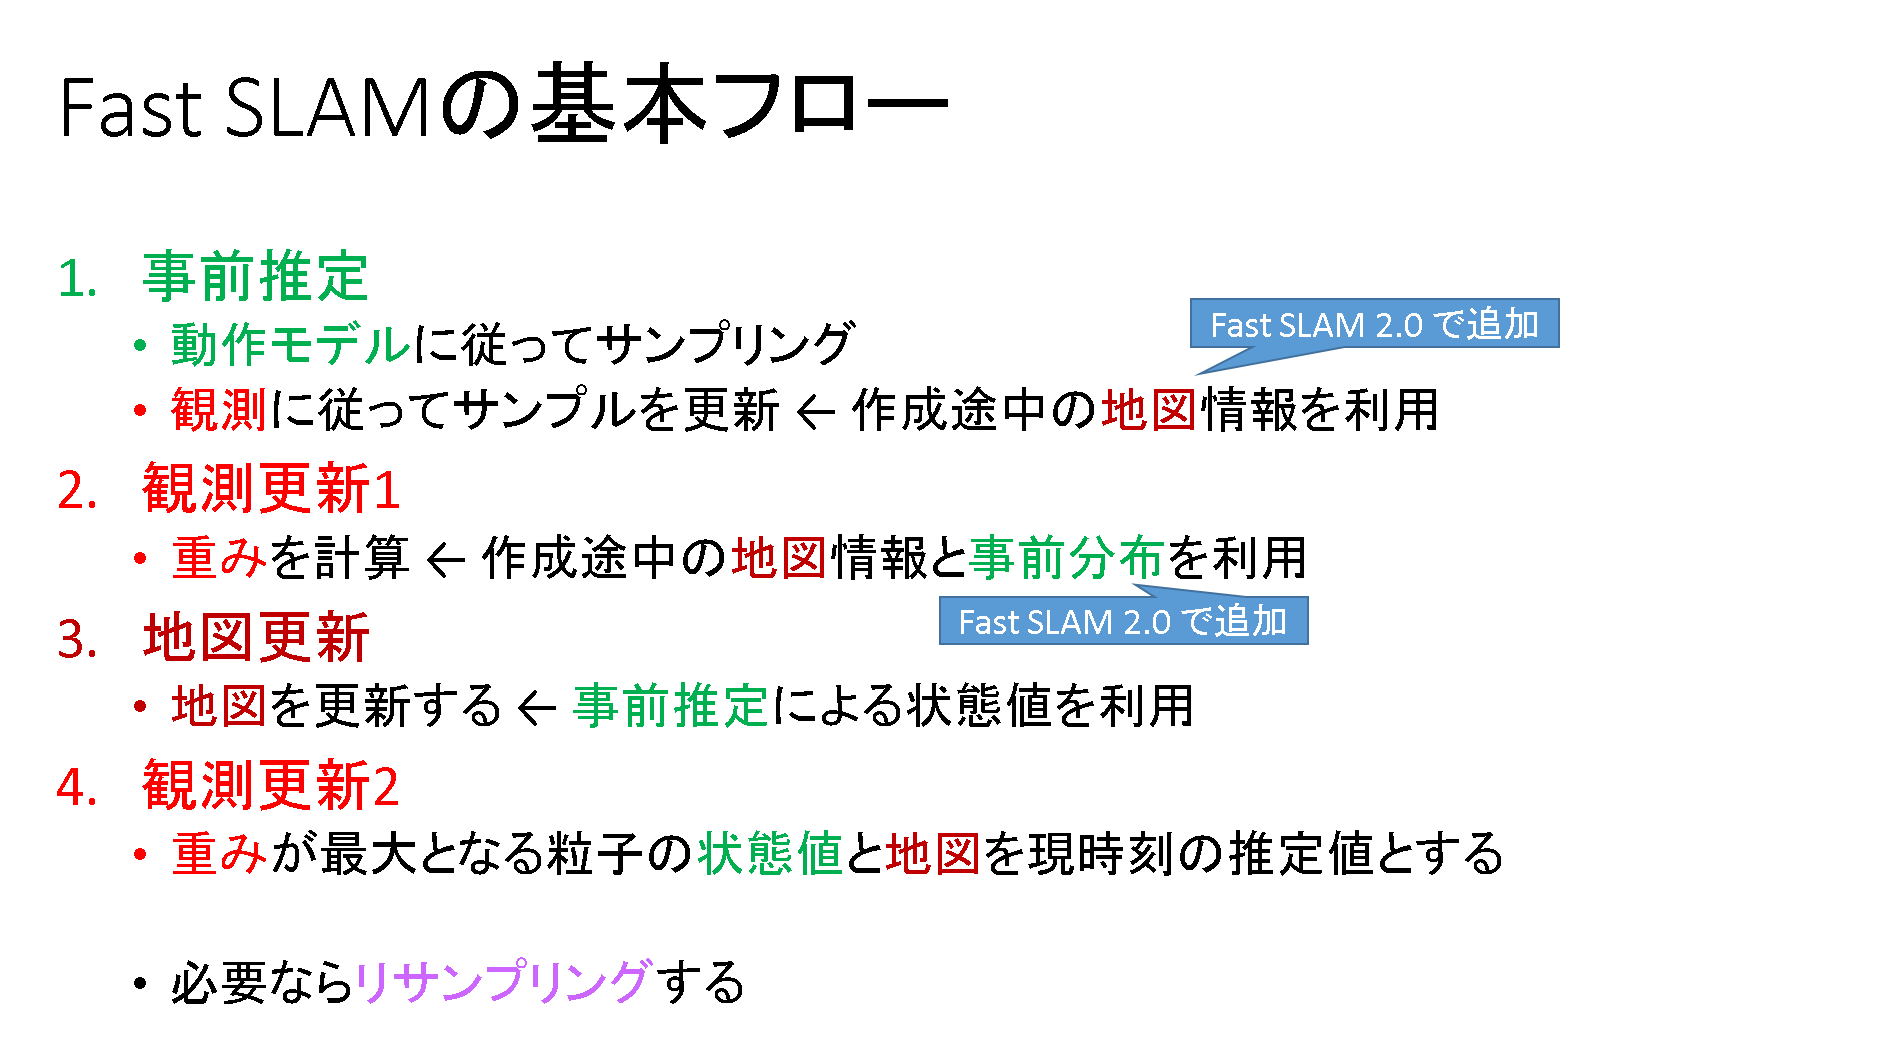 39_FastSLAMの基本フロー_2.png